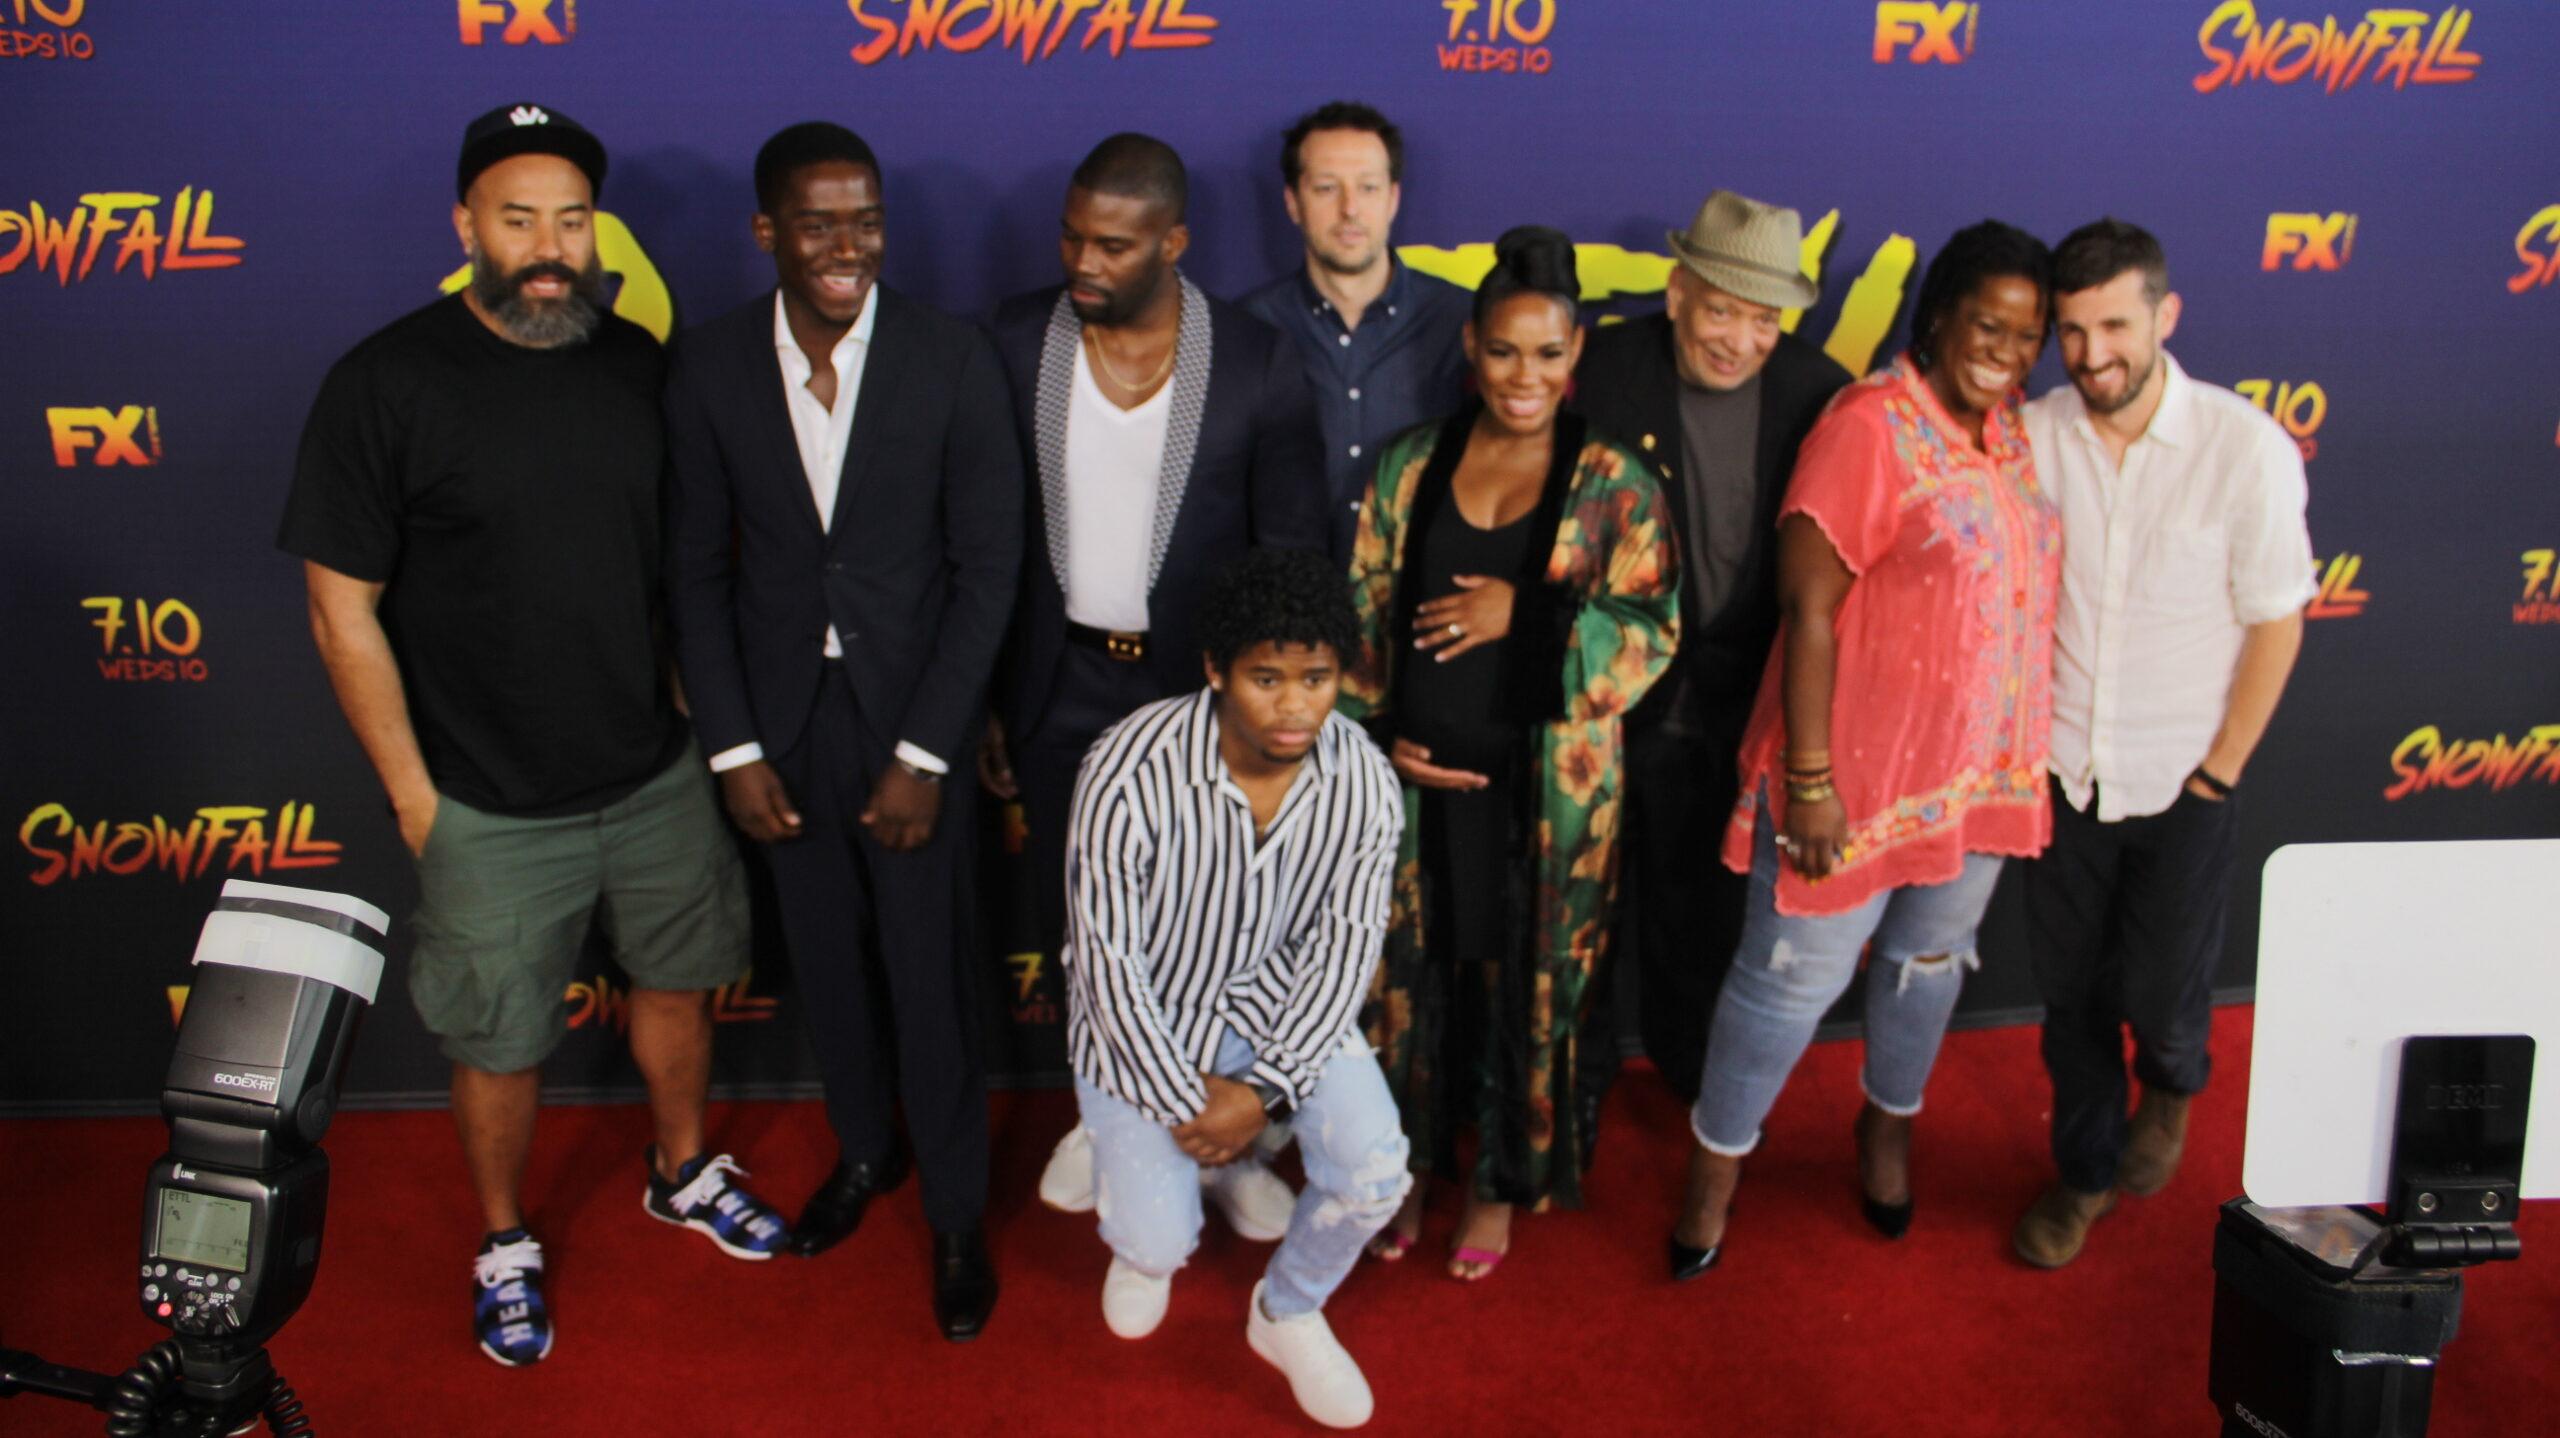 'Snowfall' Cast Talk John Singleton's Legacy at NYC Season 3 Premiere